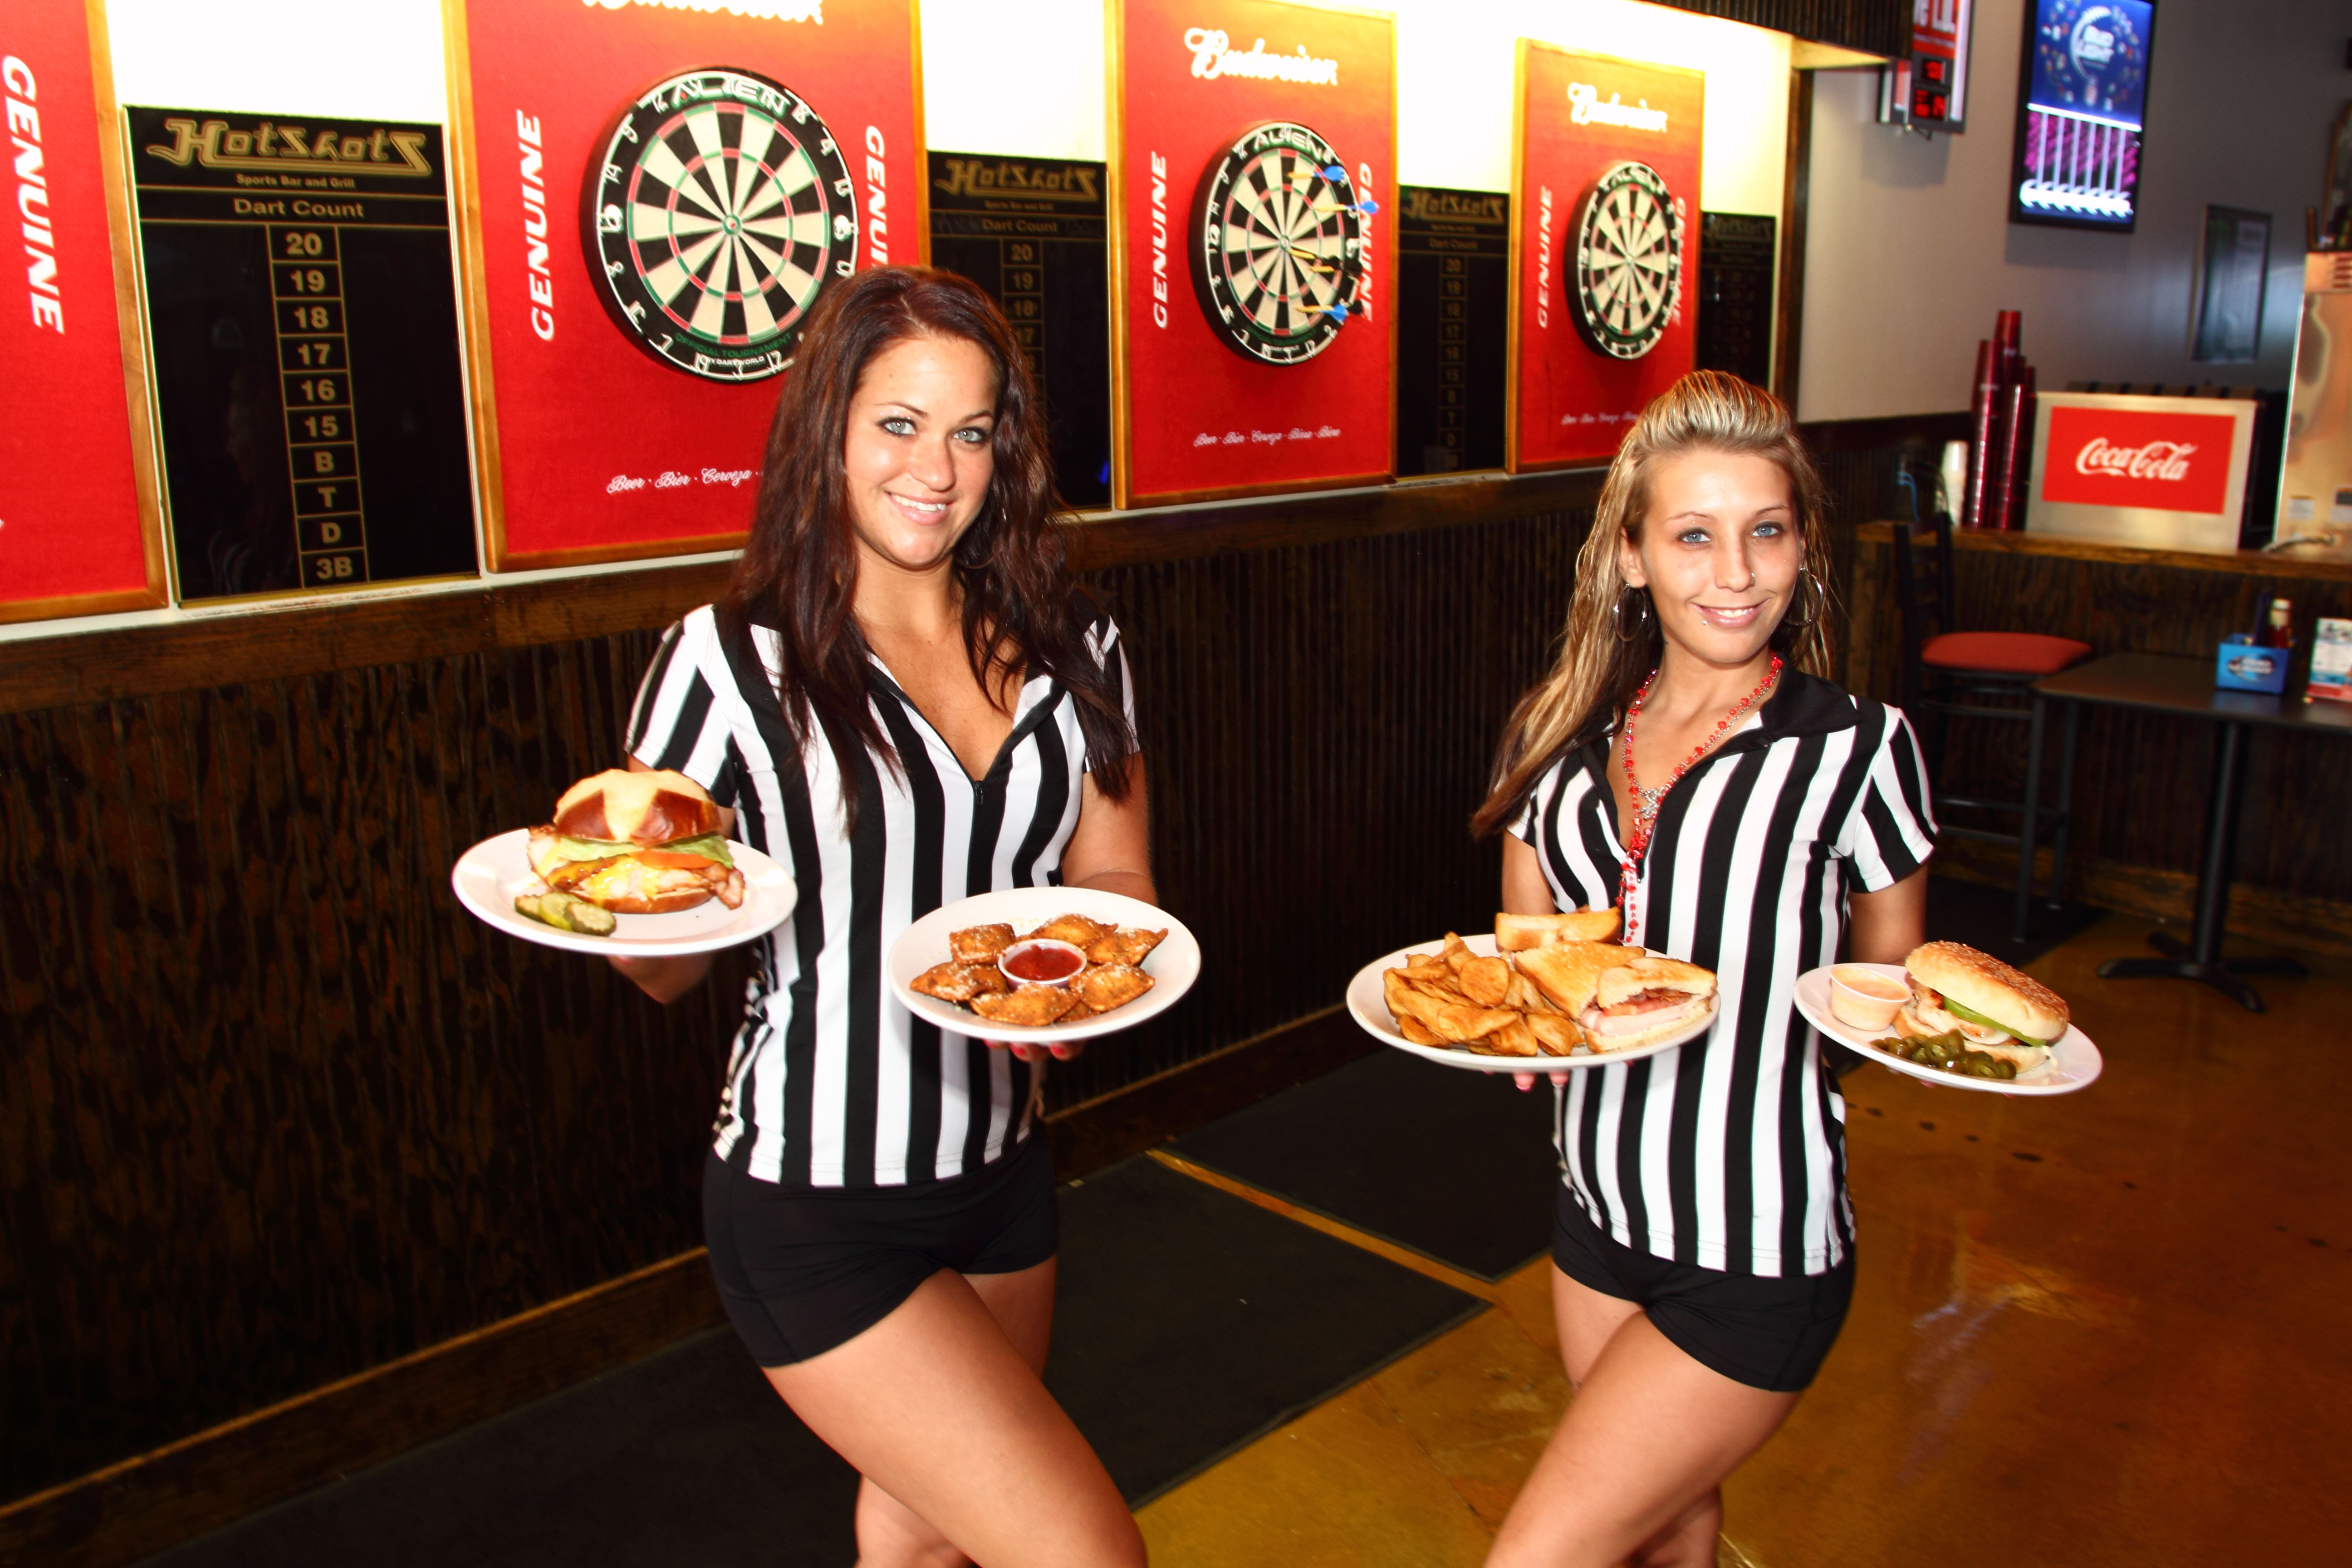 Hotshots Sports Bar and Grill